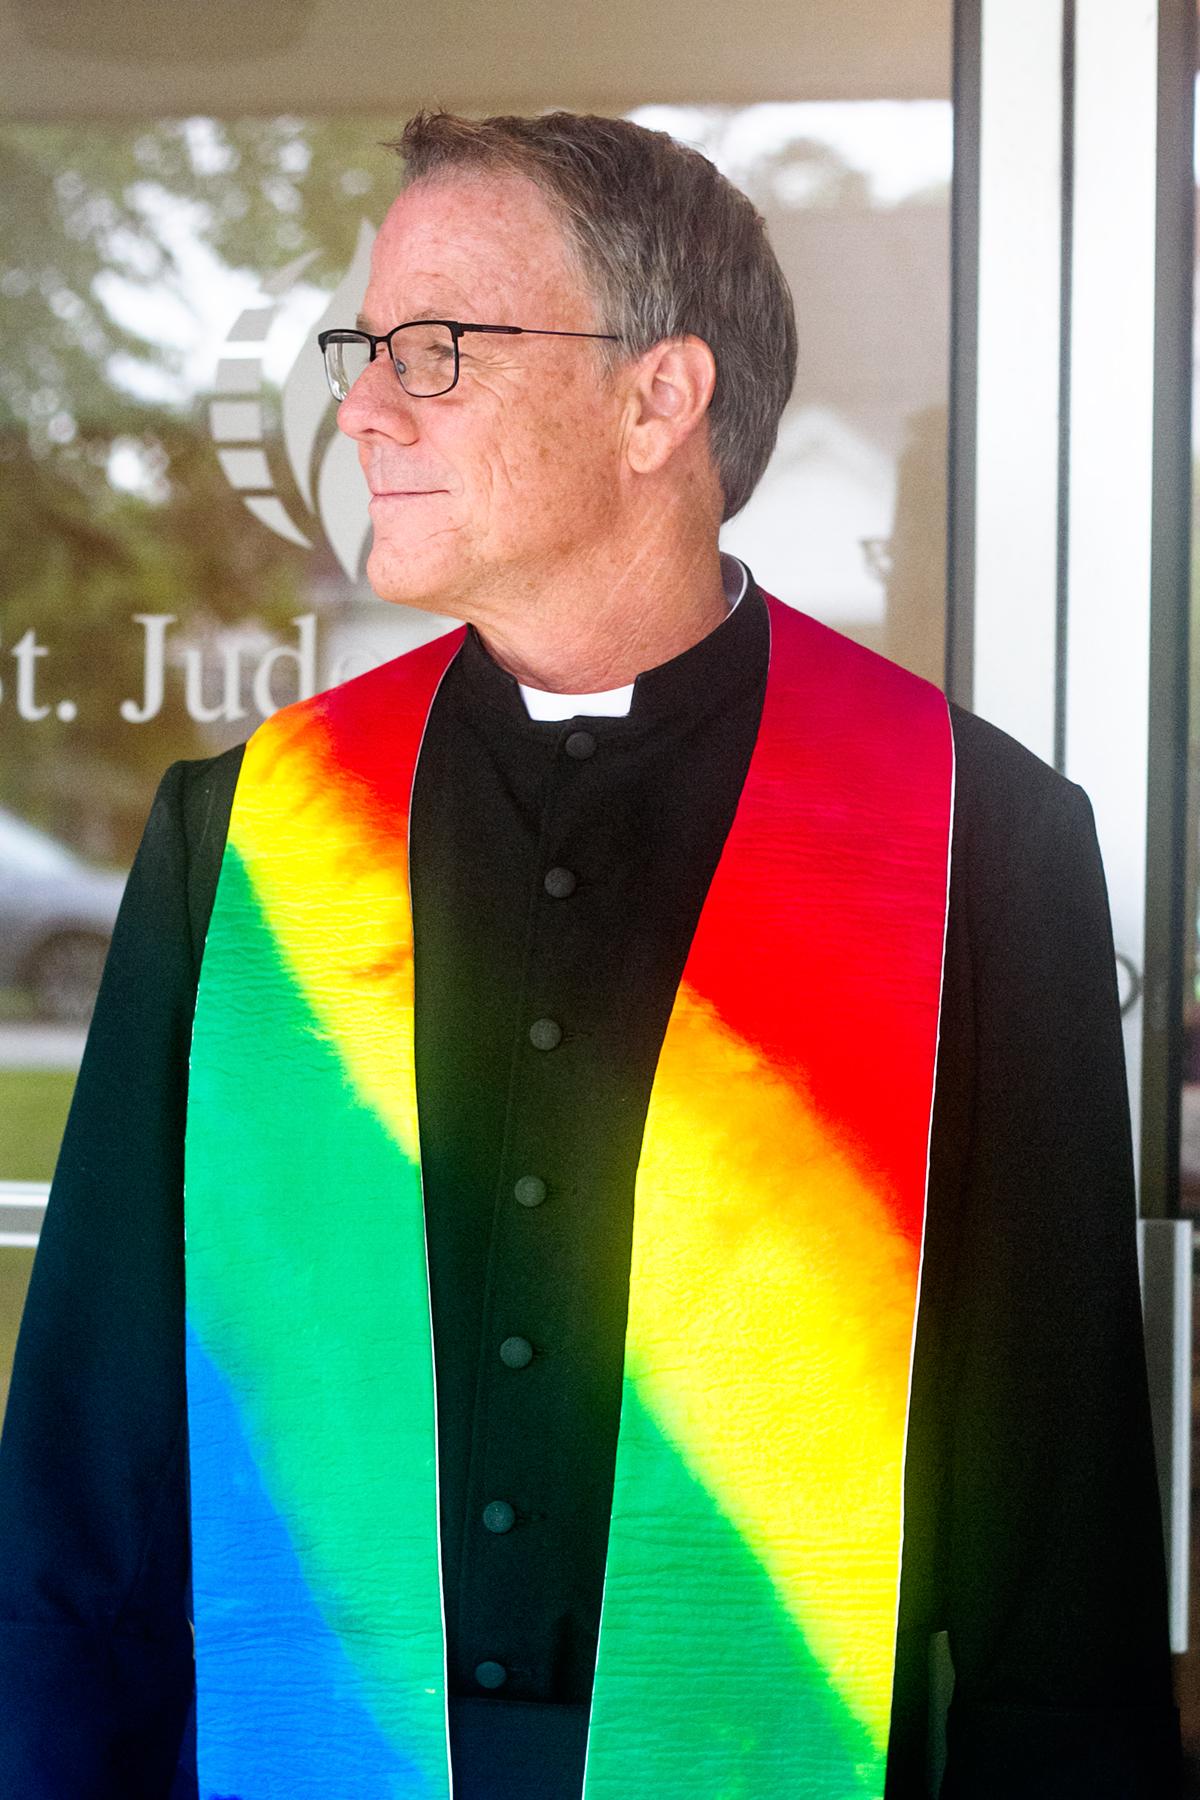 Rev. John McLaughlin has lead St. Jude's MCC in Wilmington for over a decade. (Port City Daily photo/Johanna F. Still)